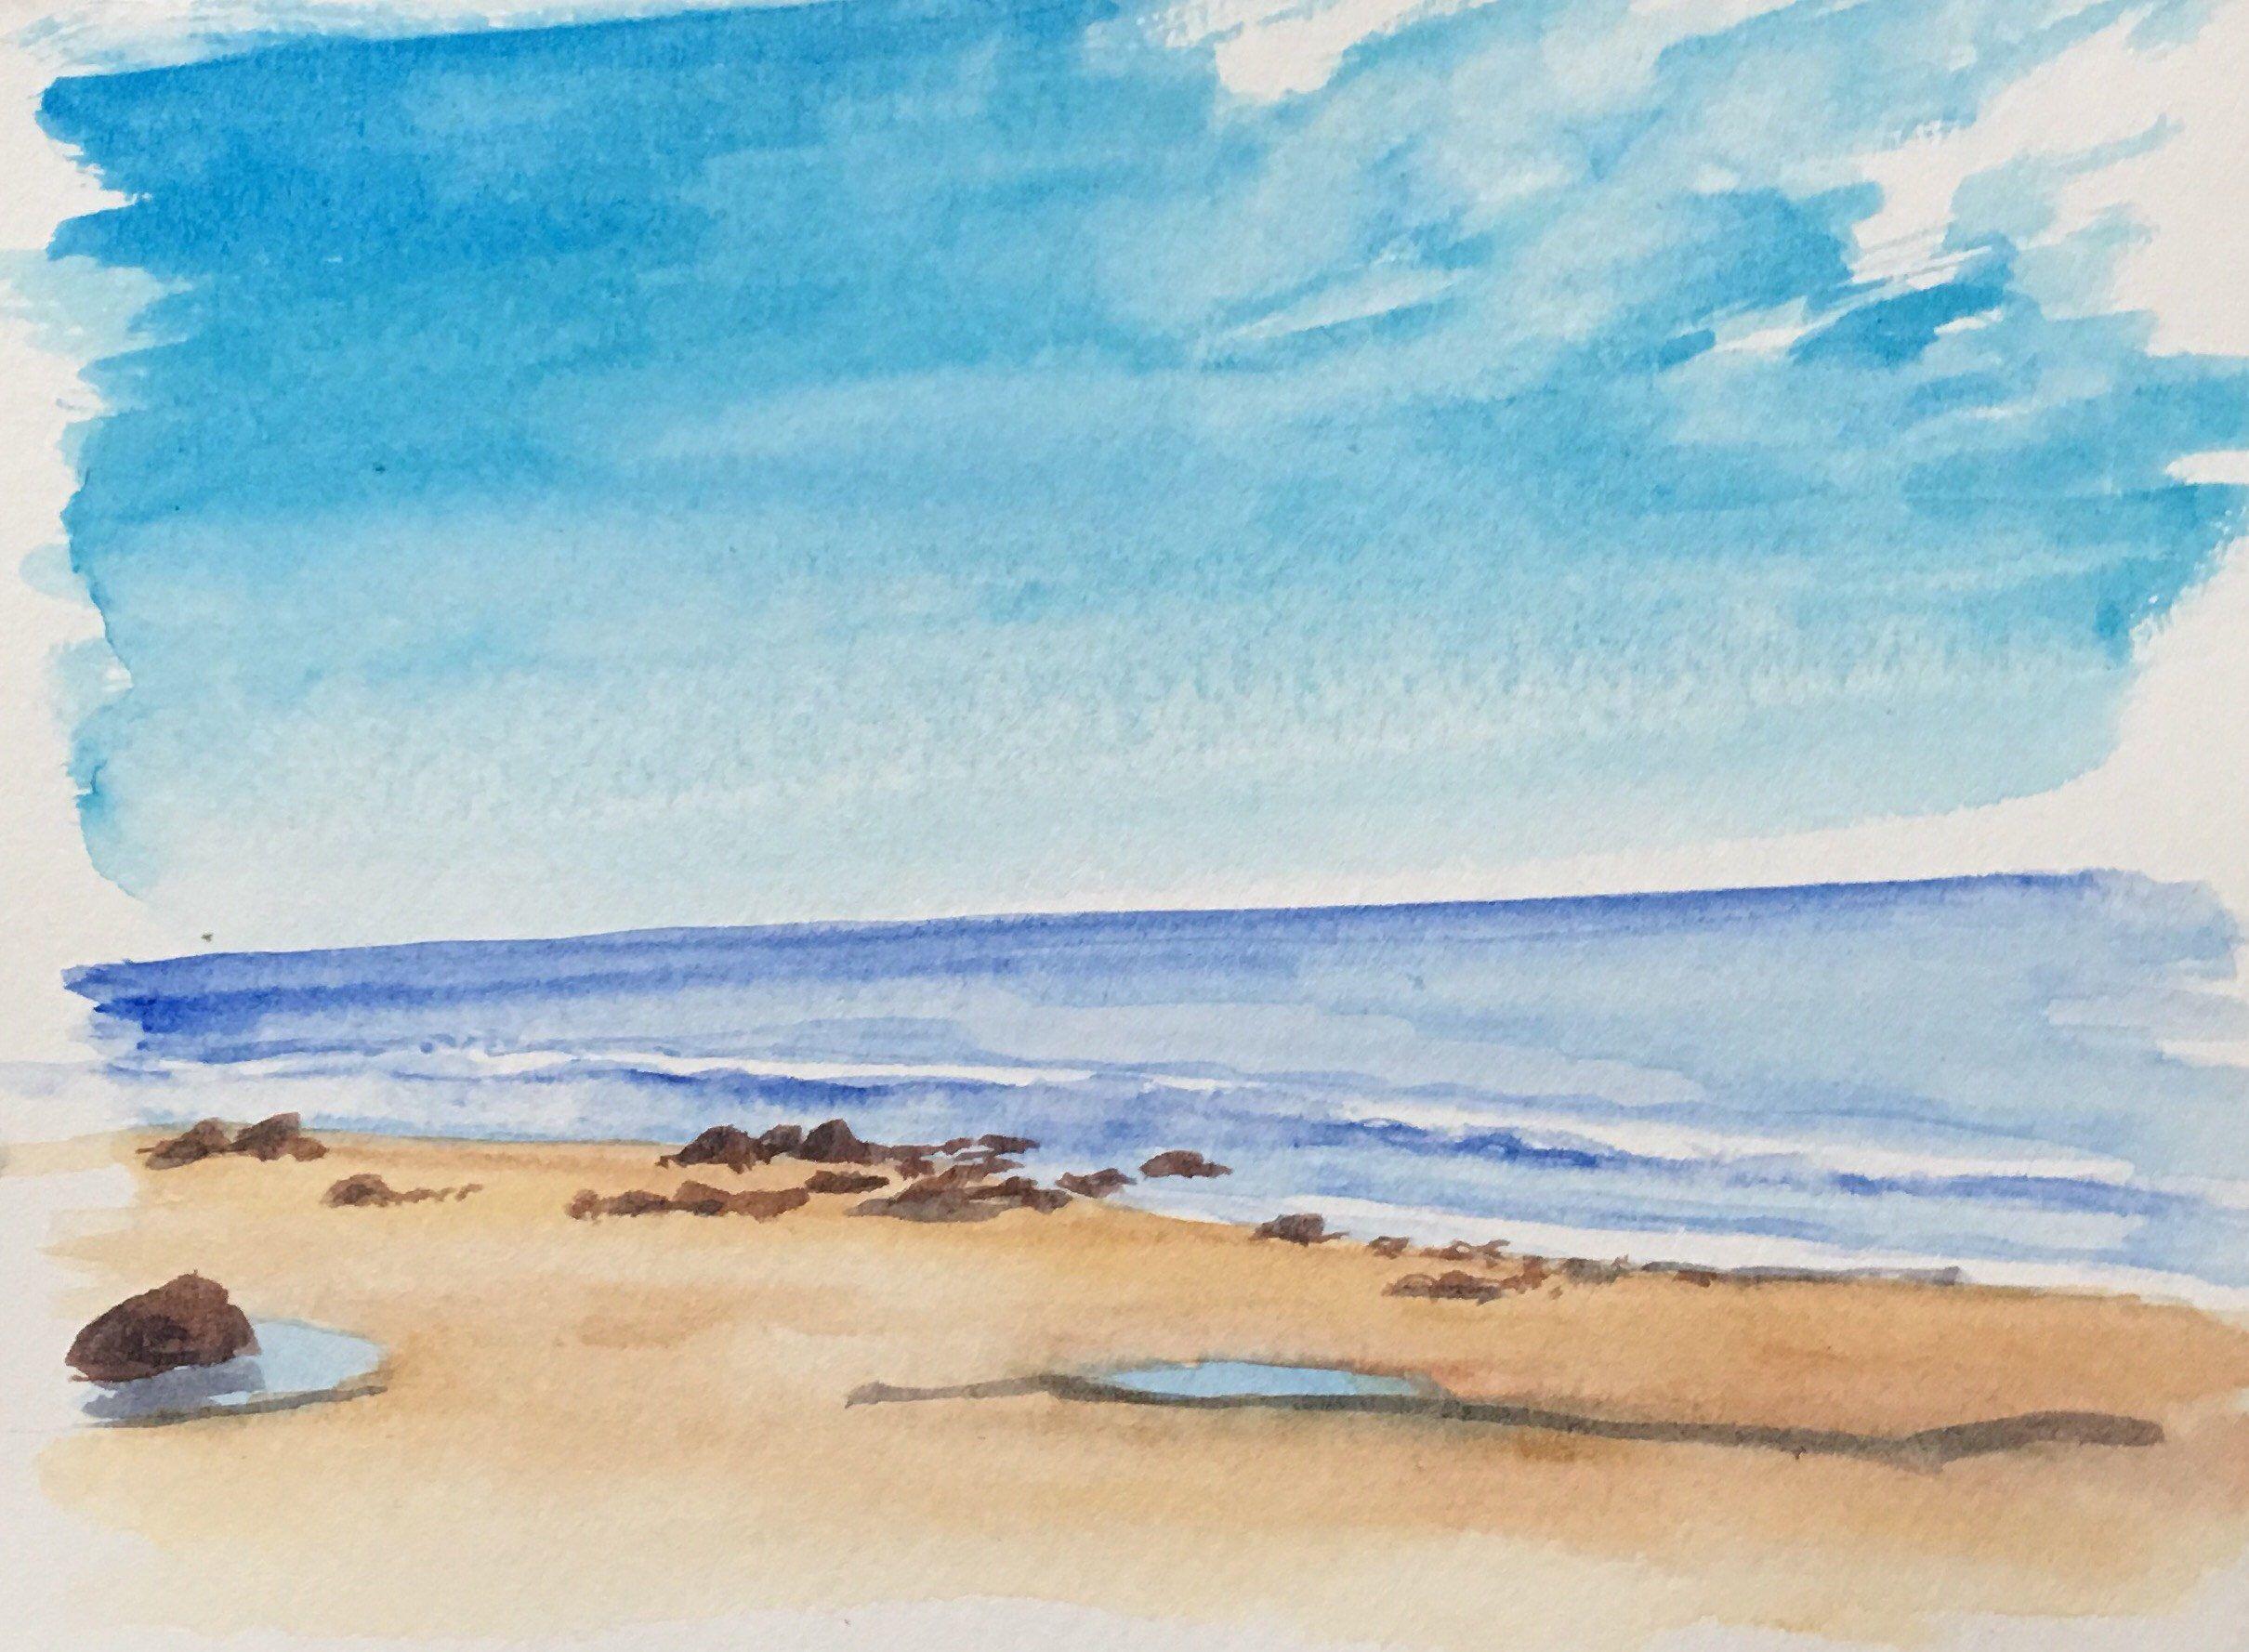 Abstract Sea In 2020 Watercolor Ocean Watercolor Paintings